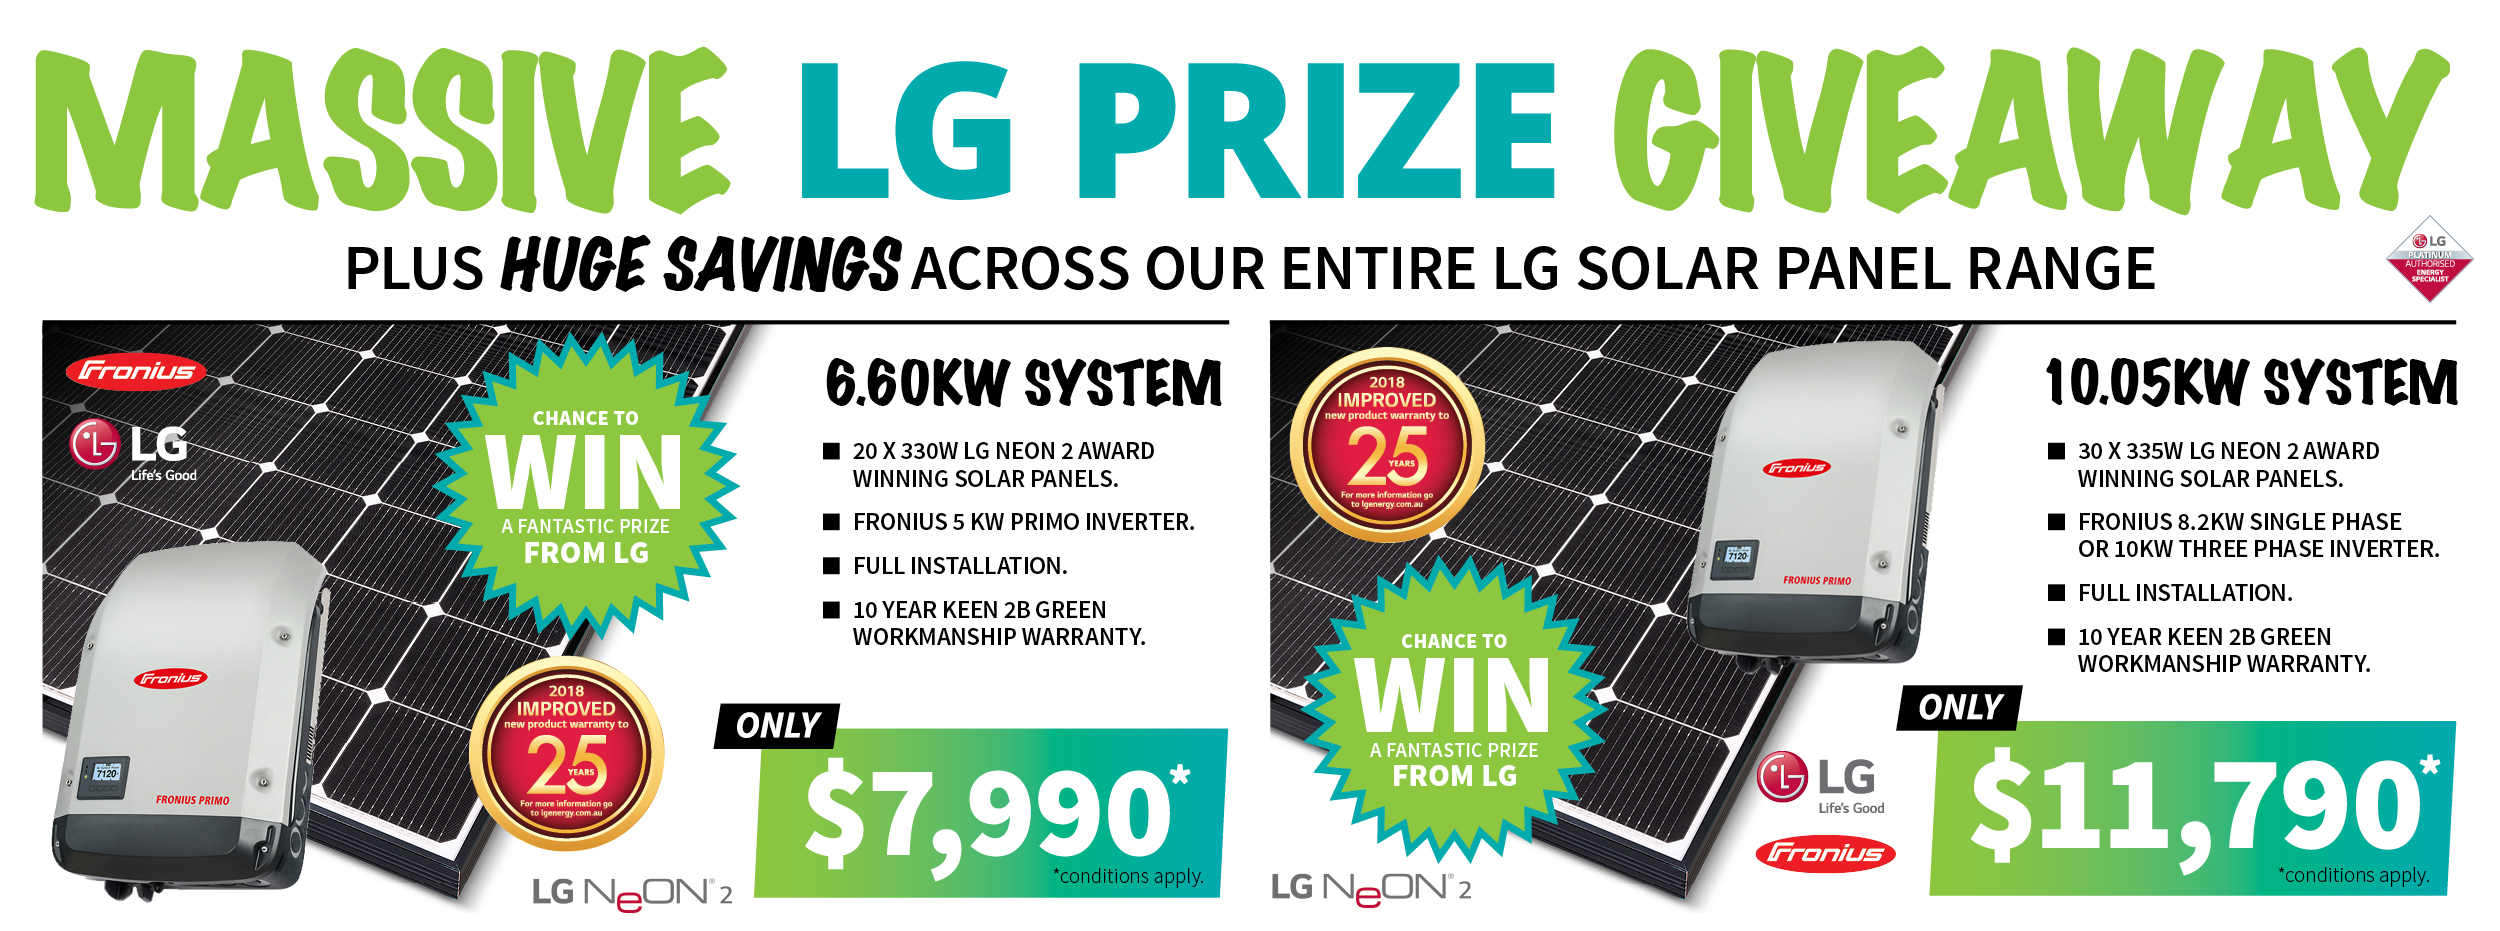 LG Appliance Giveaway - Keen 2B Green